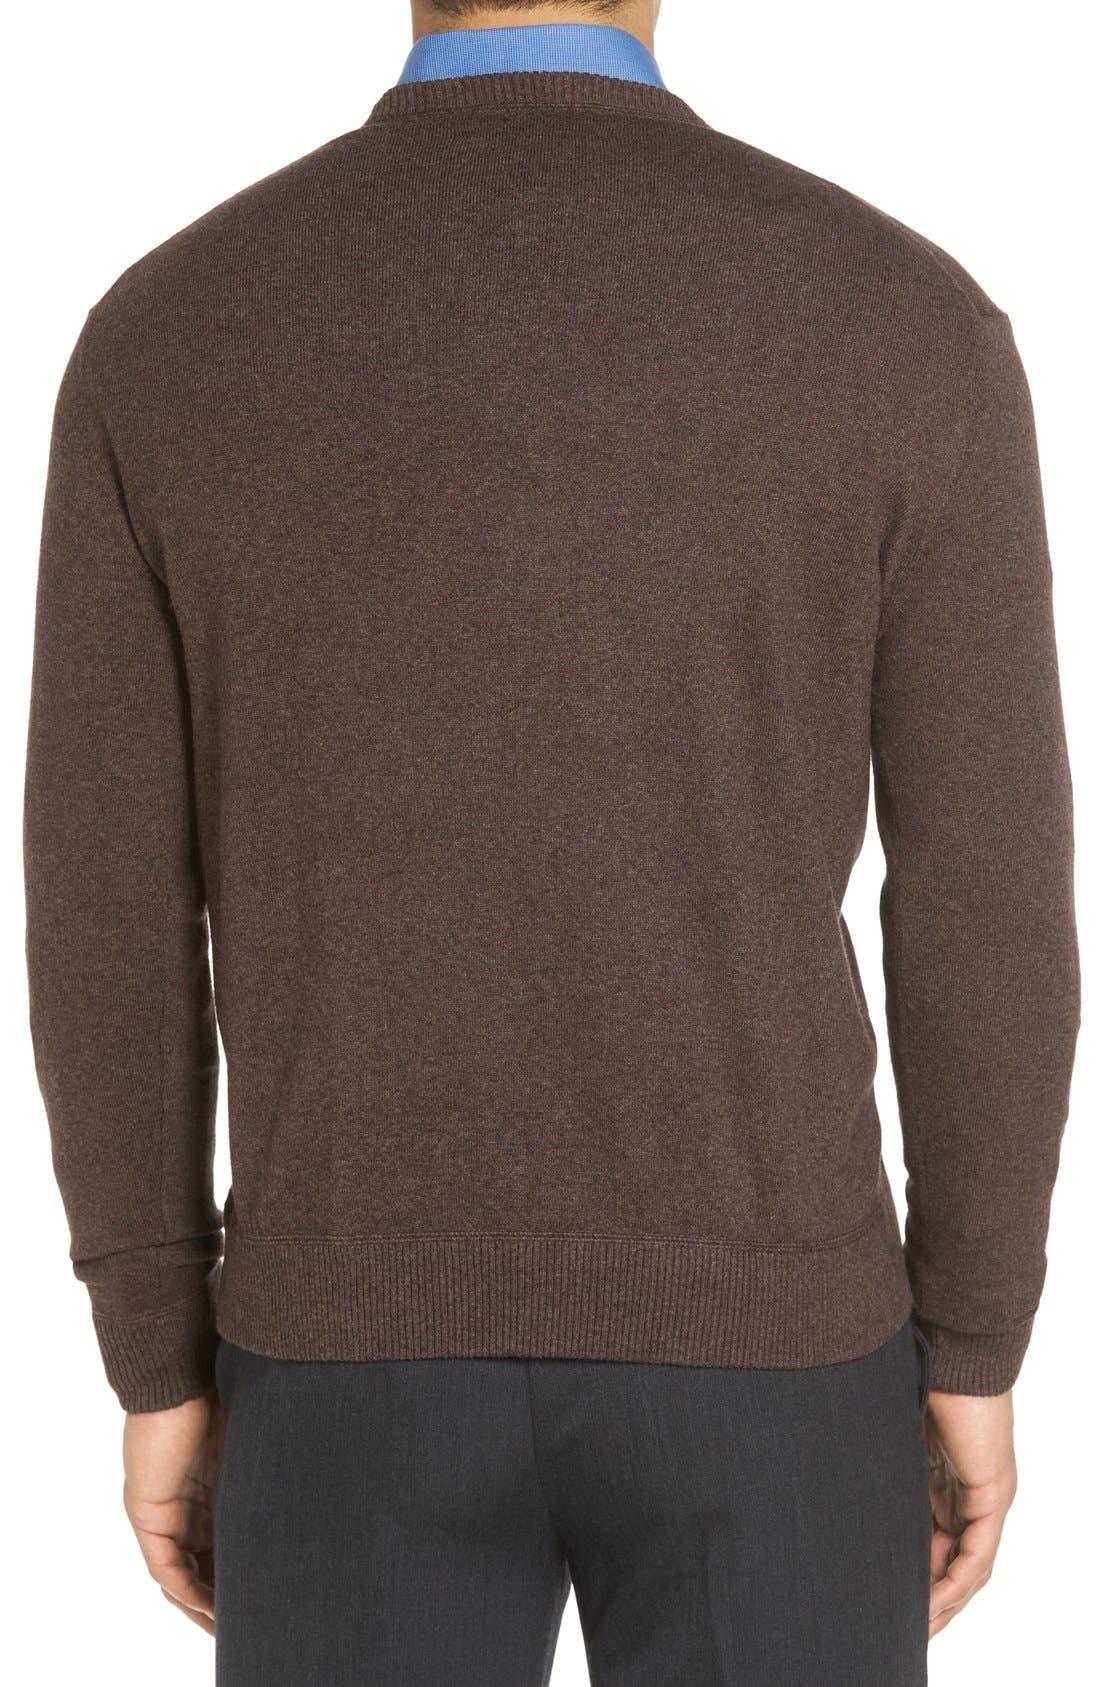 'Jersey Sport' Cotton Blend Crewneck Sweater,                             Alternate thumbnail 11, color,